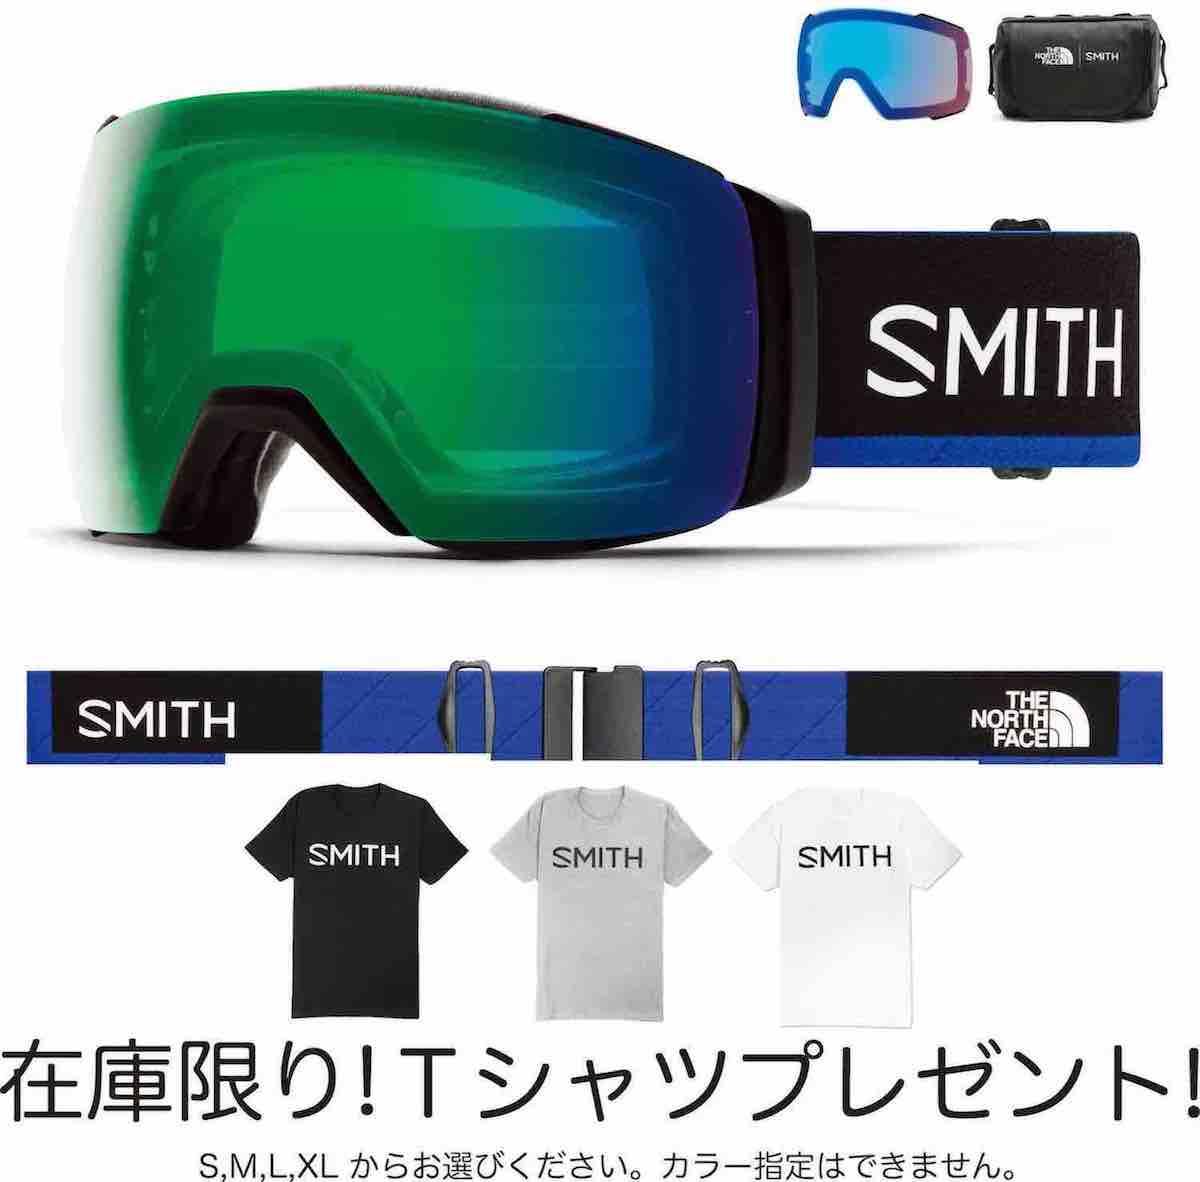 【SMITH Tシャツ付】 SMITH I/O MAG XL BLUE CP-EVERYDAY GREEN SMITH x THENORTHFACE ノースフェイス スミス アイオーマグ 数量限定 ノースフェイスコラボモデル